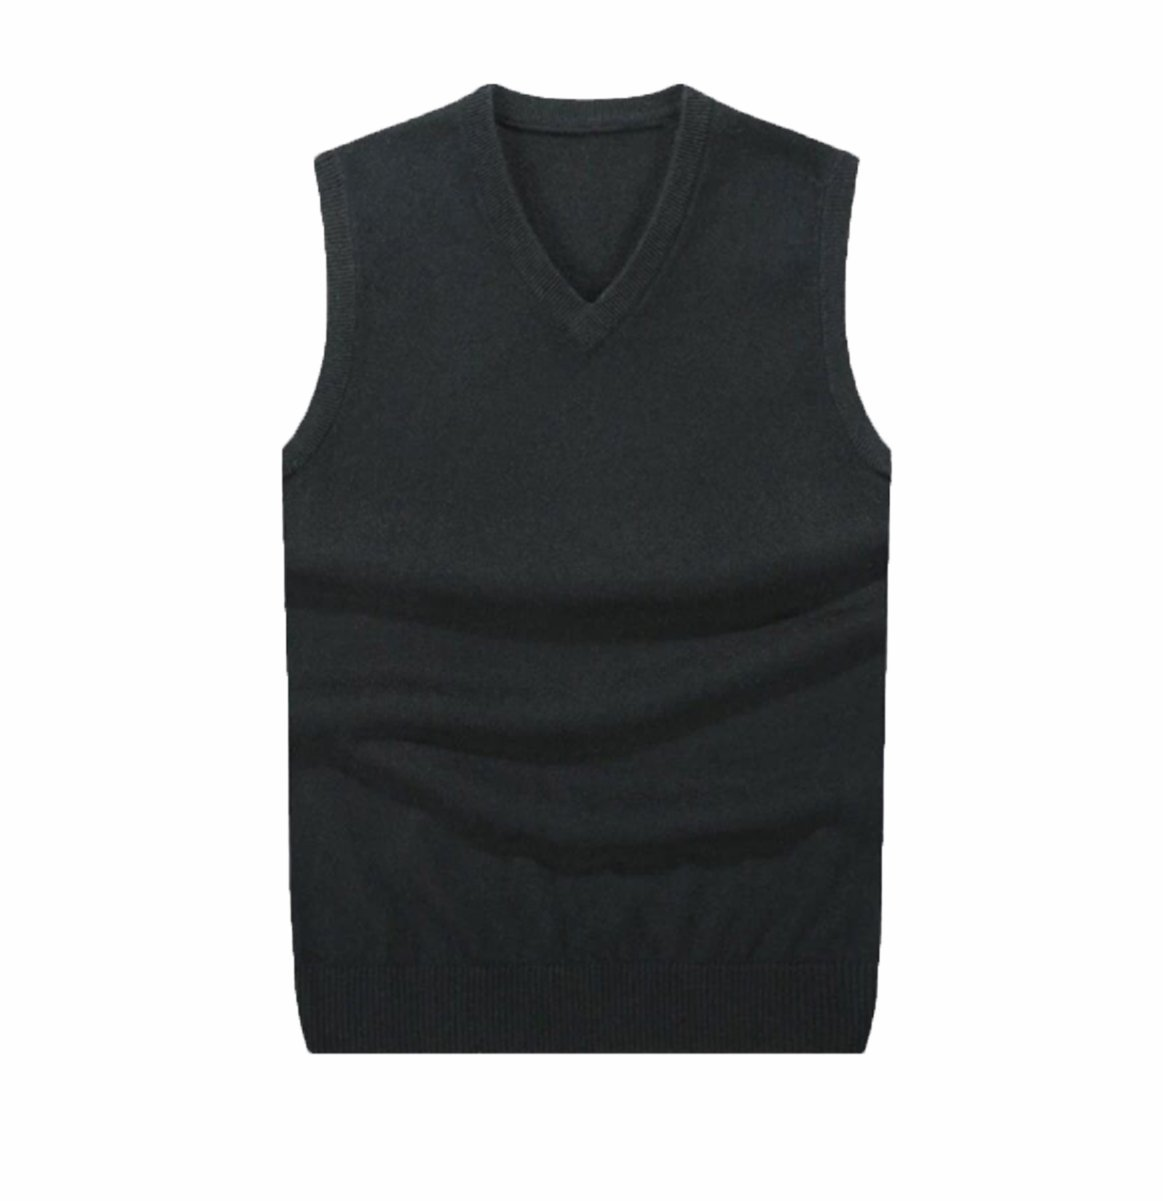 Albee Yang Men's Cashmere Vest Warm Slim Fit V-Neck Knitwear Vest Sleeveless Pullover Tops Wool Sweater Jacket Coat Solid Color Blouses (M, Black)